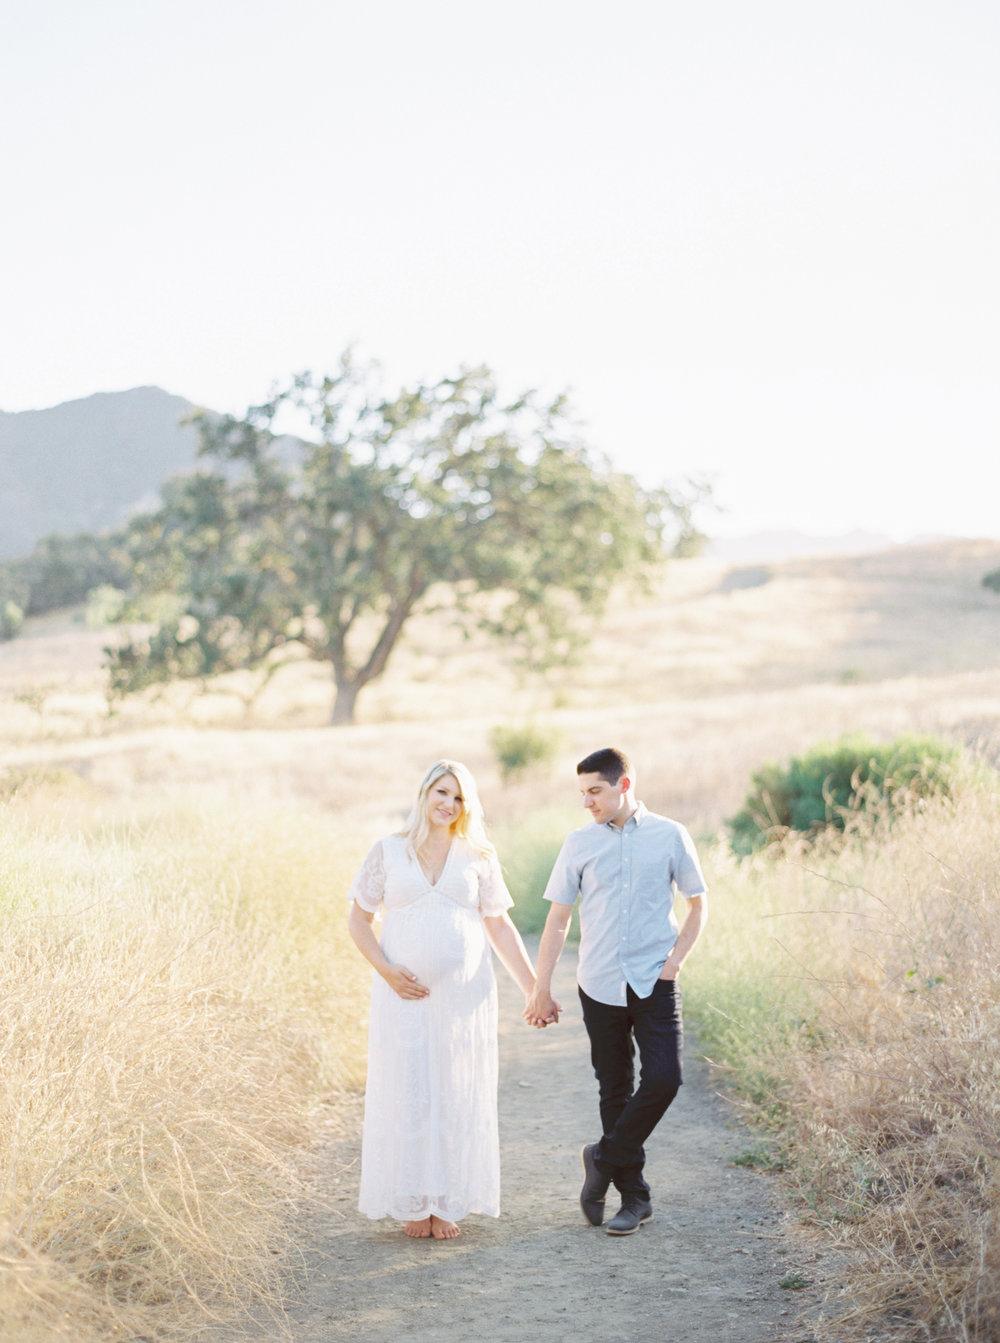 Rachel Owens Photography - Malibu Creek - Film Photography-15.jpg